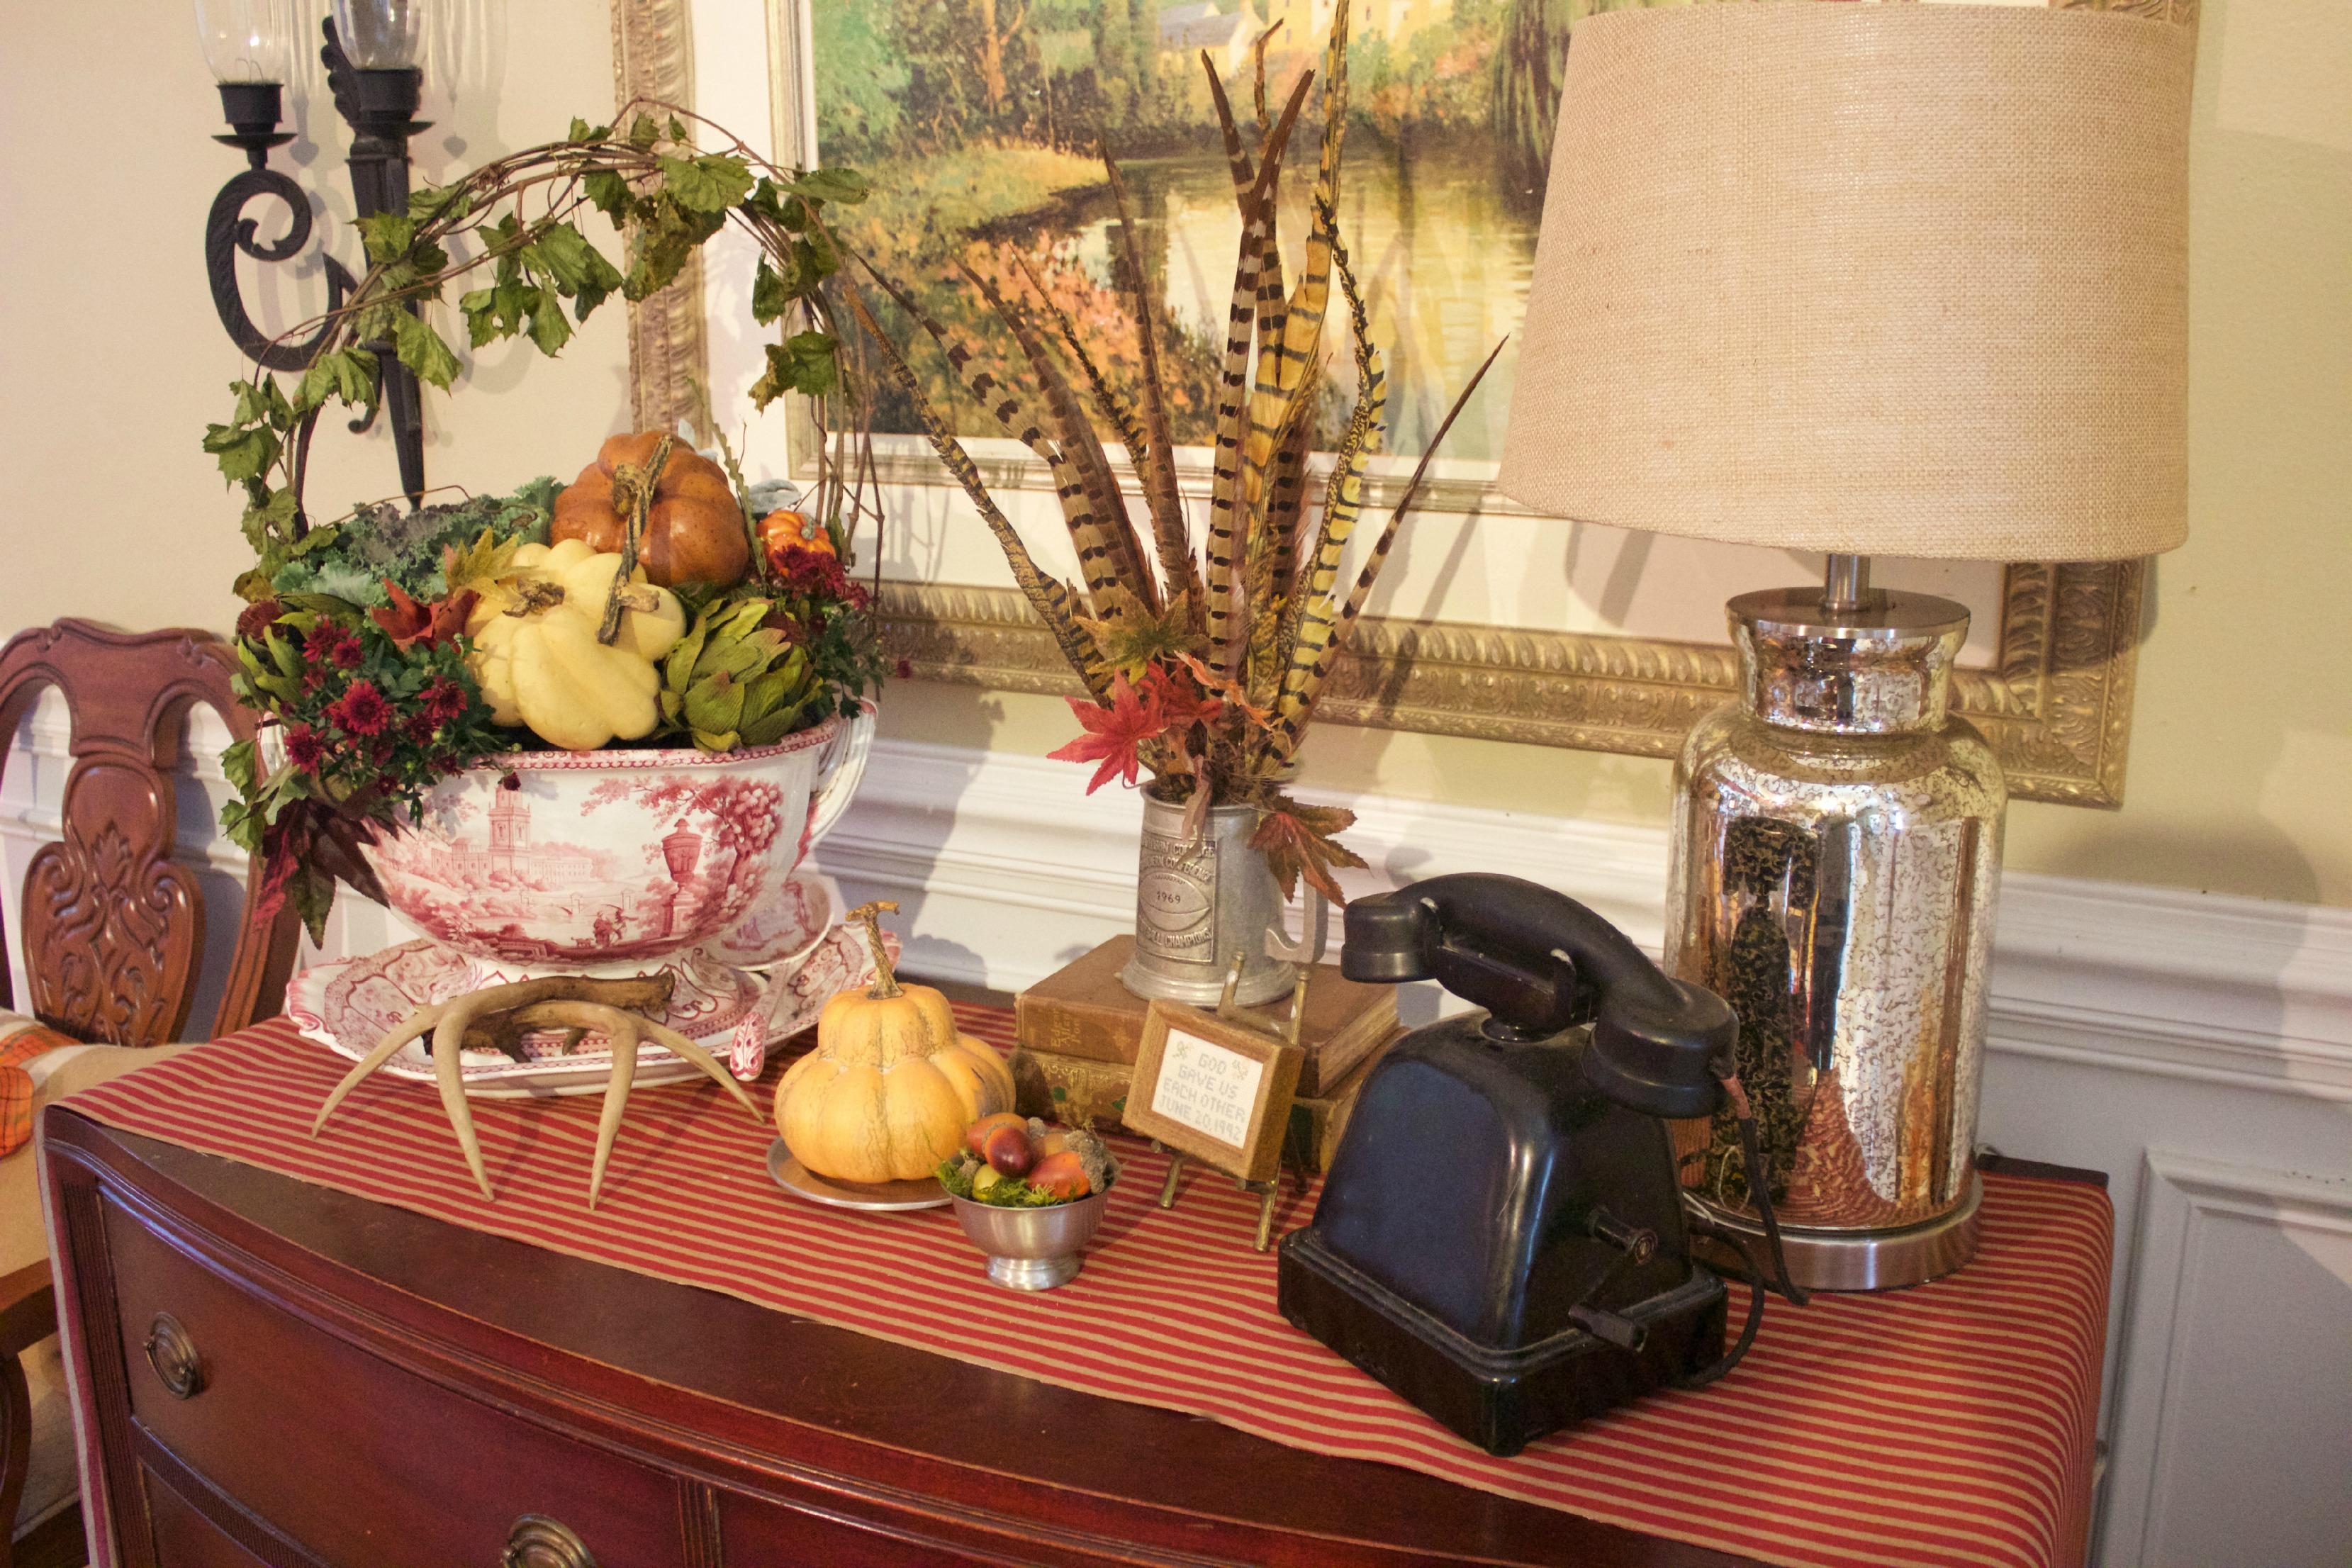 Traditional Fall Sideboard | The Everyday Home | www.everydayhomeblog.com